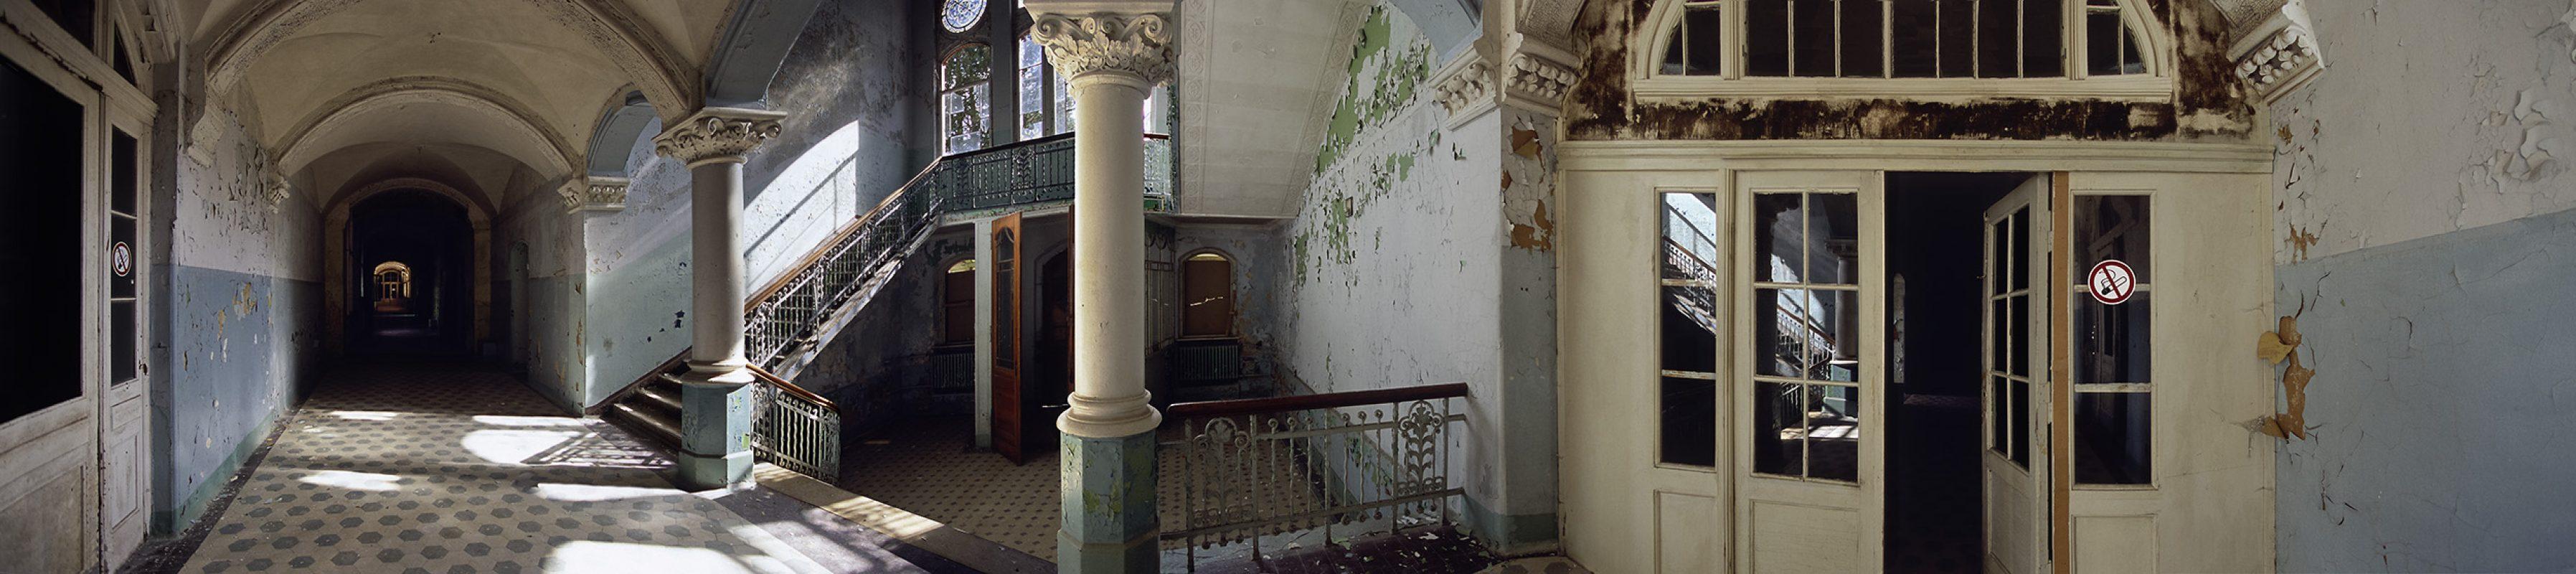 Beelitz-Heilstätten, Halle